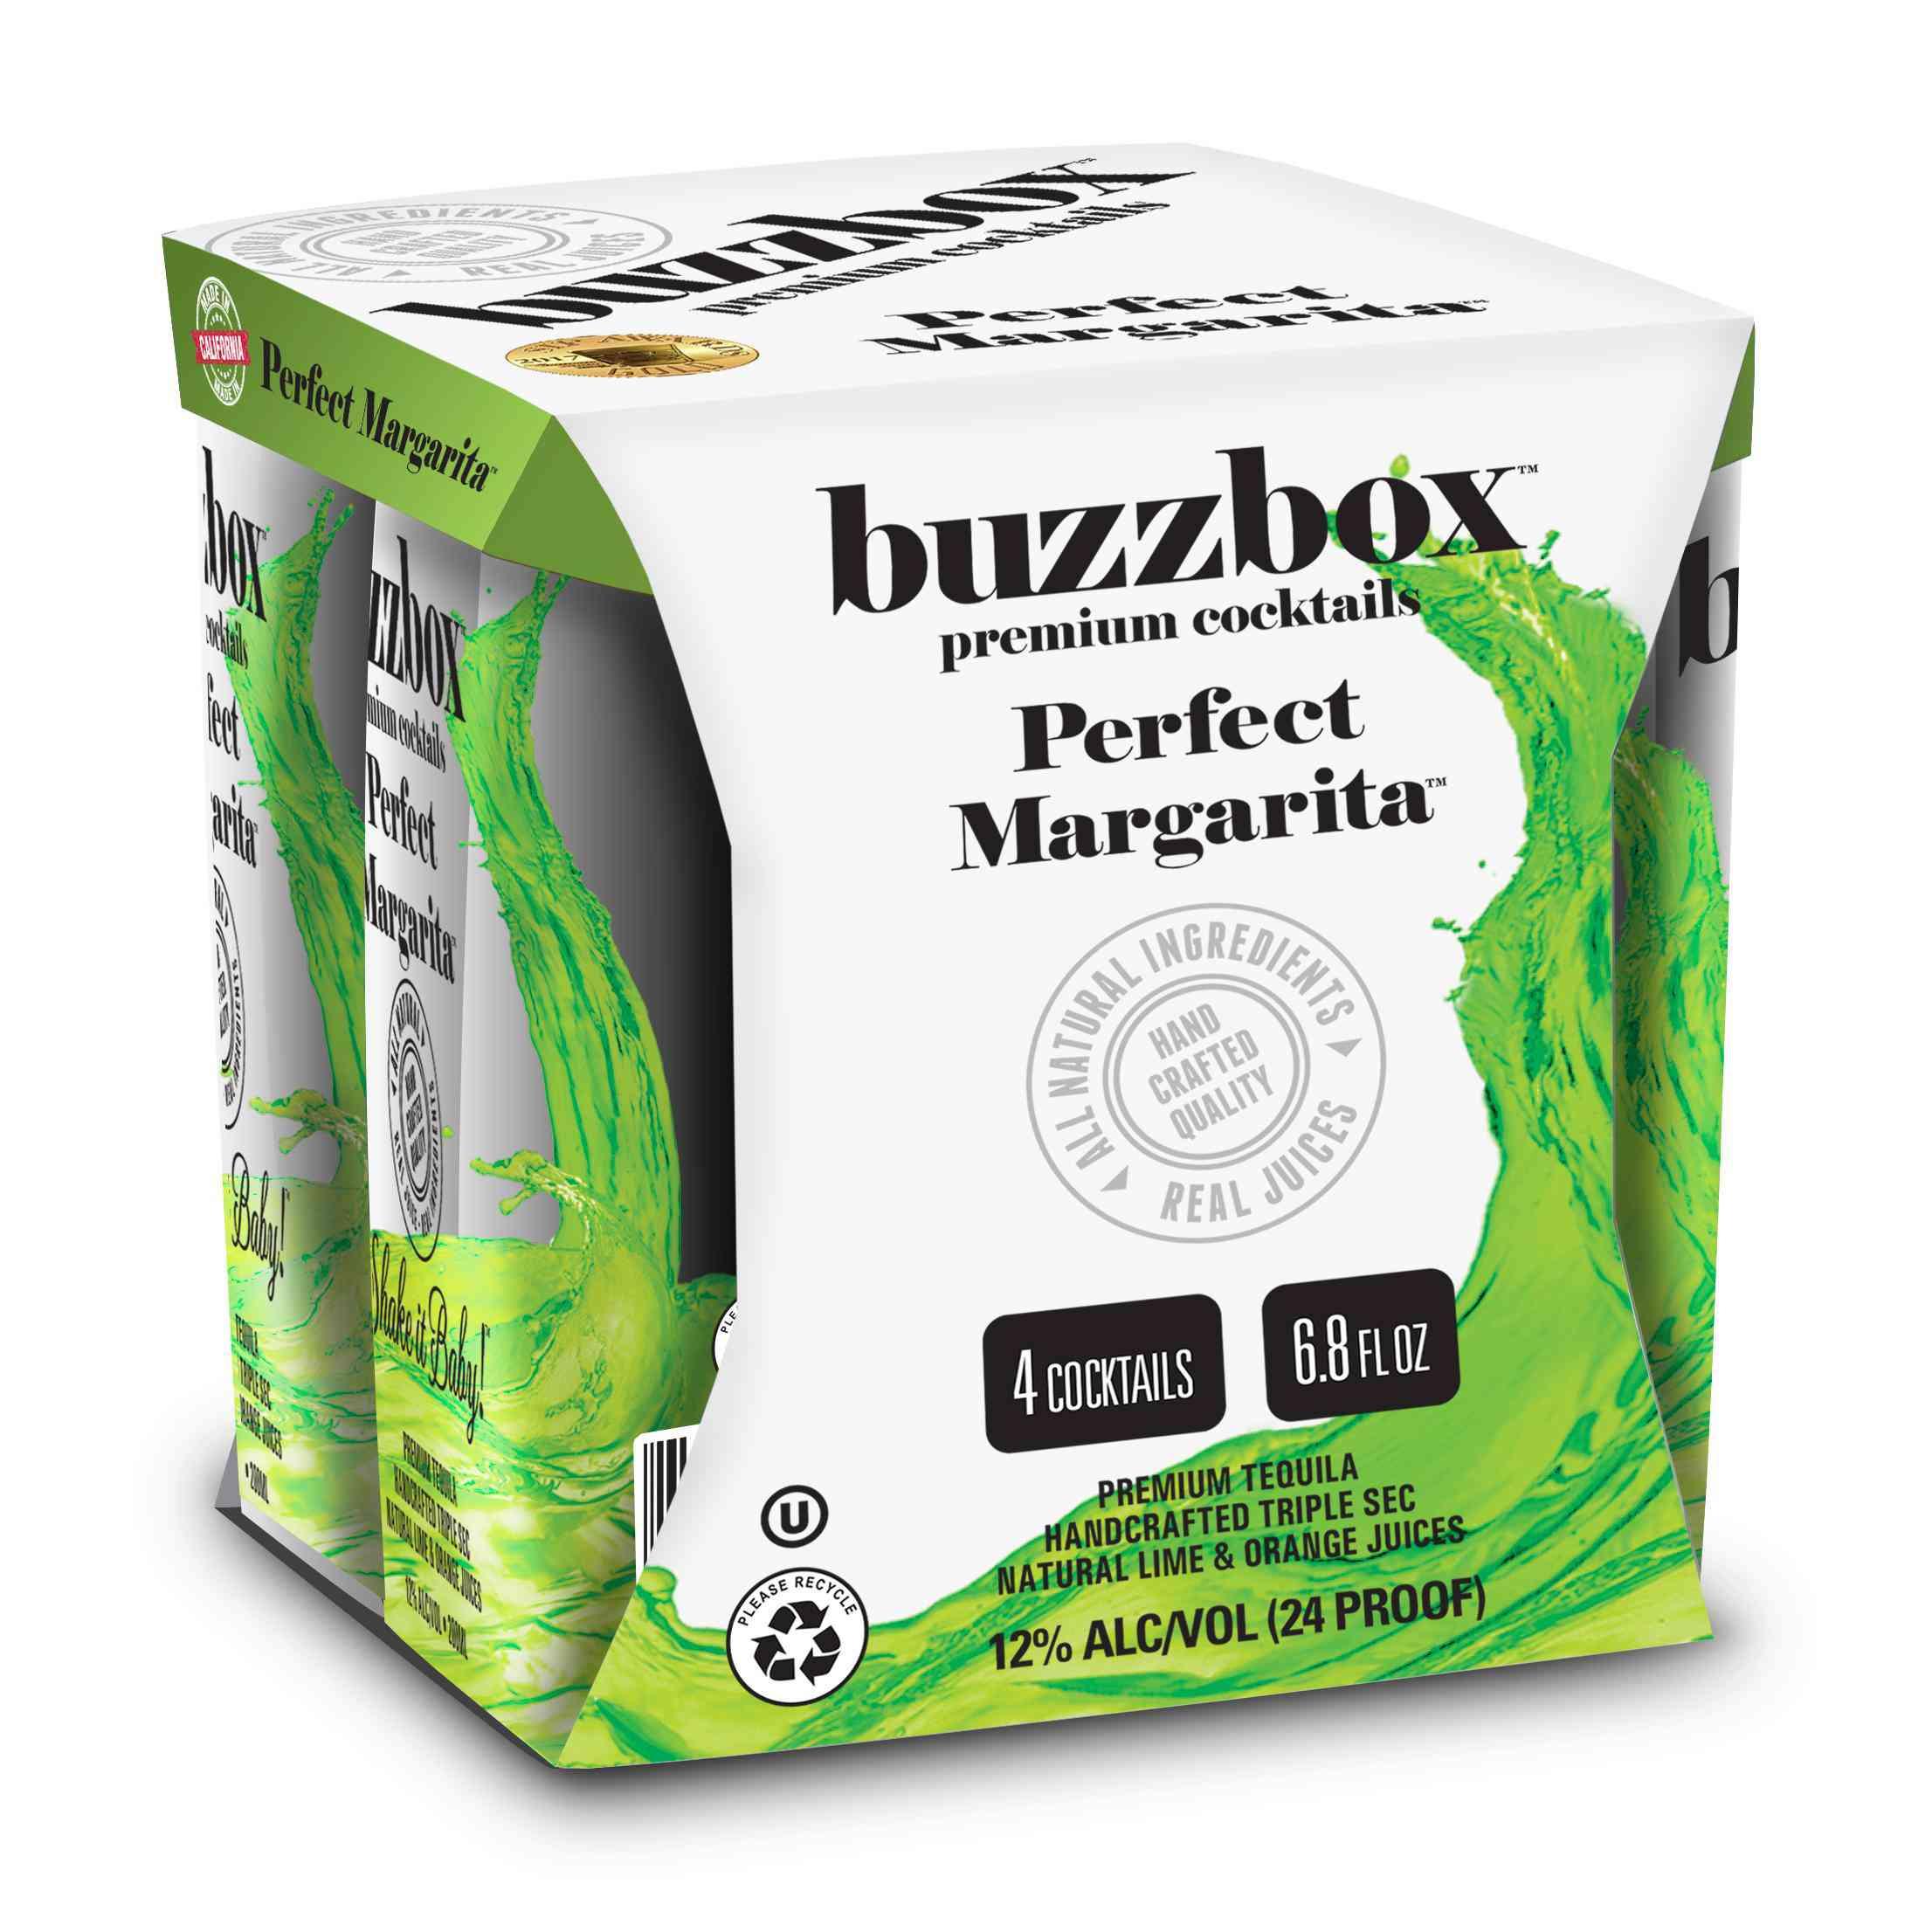 Buzzbox Margarita